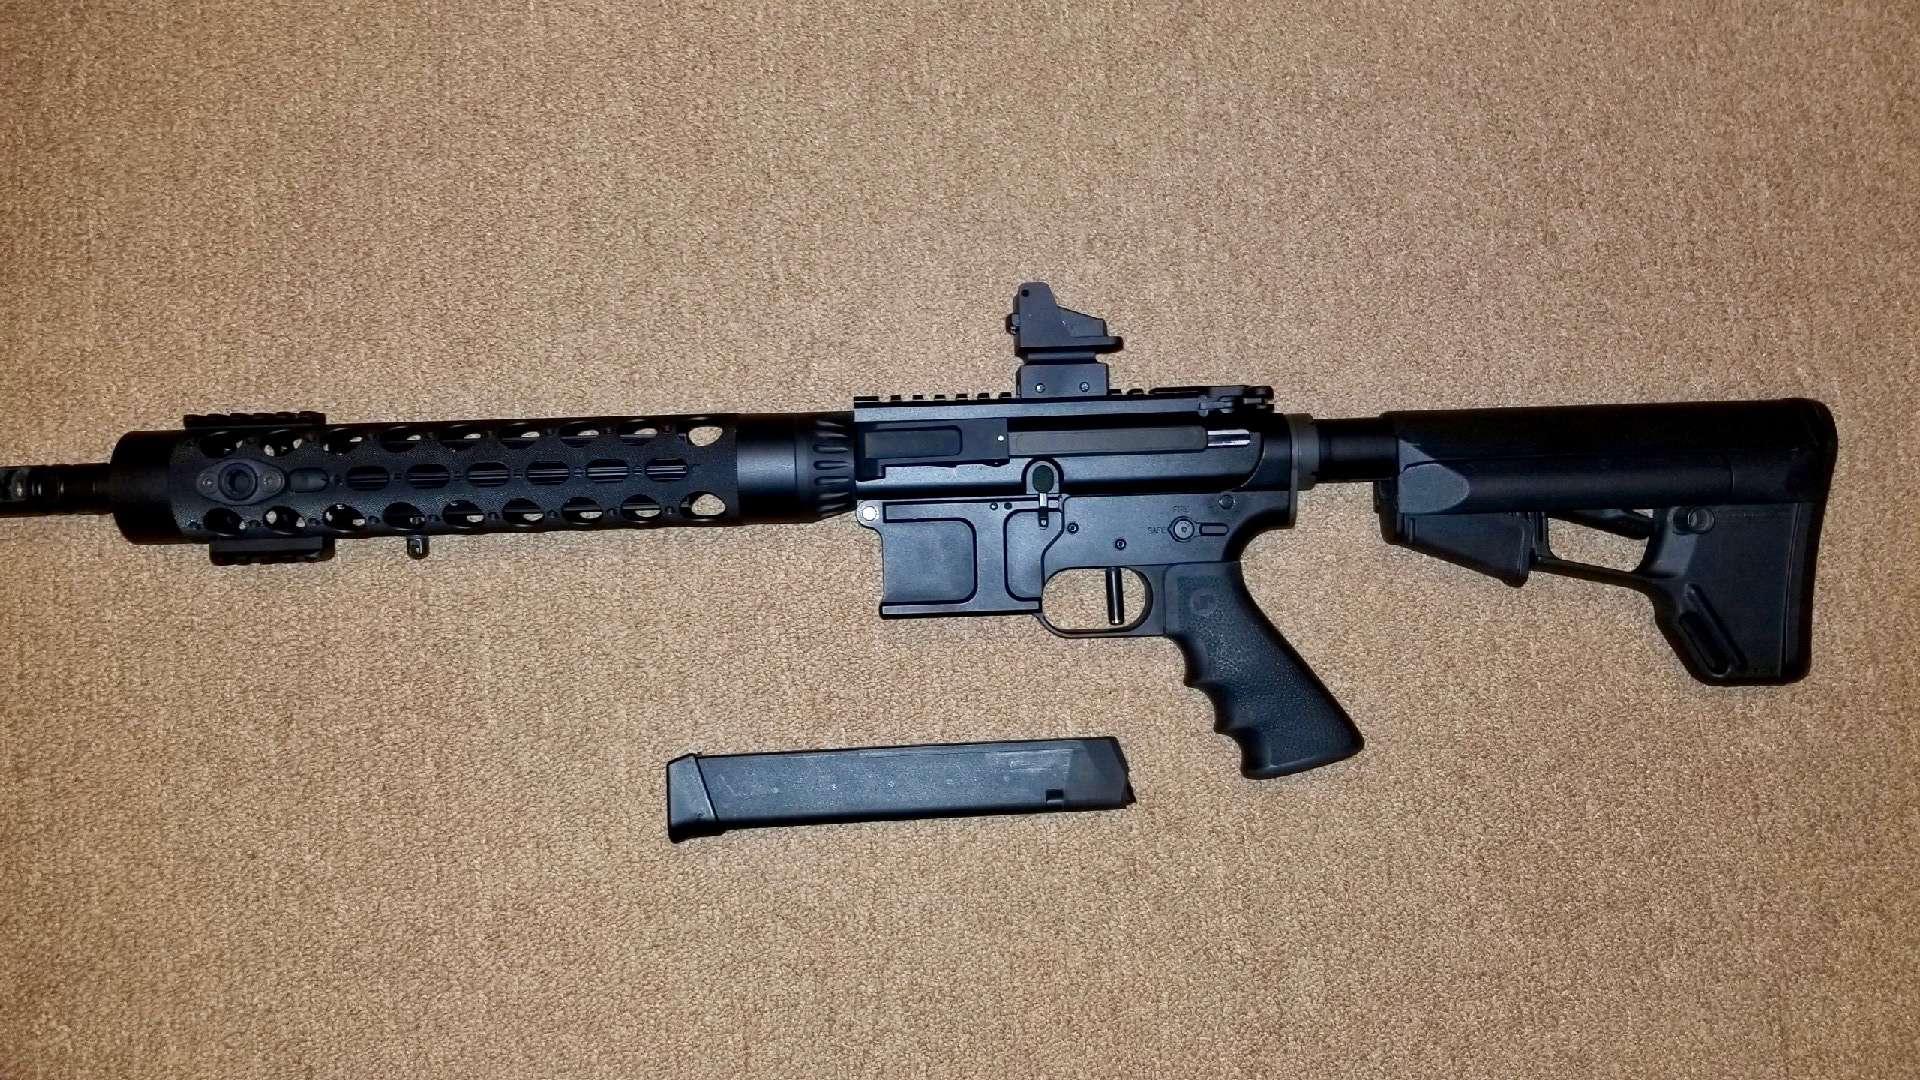 JP 9mm Carbine - 24hourcampfire